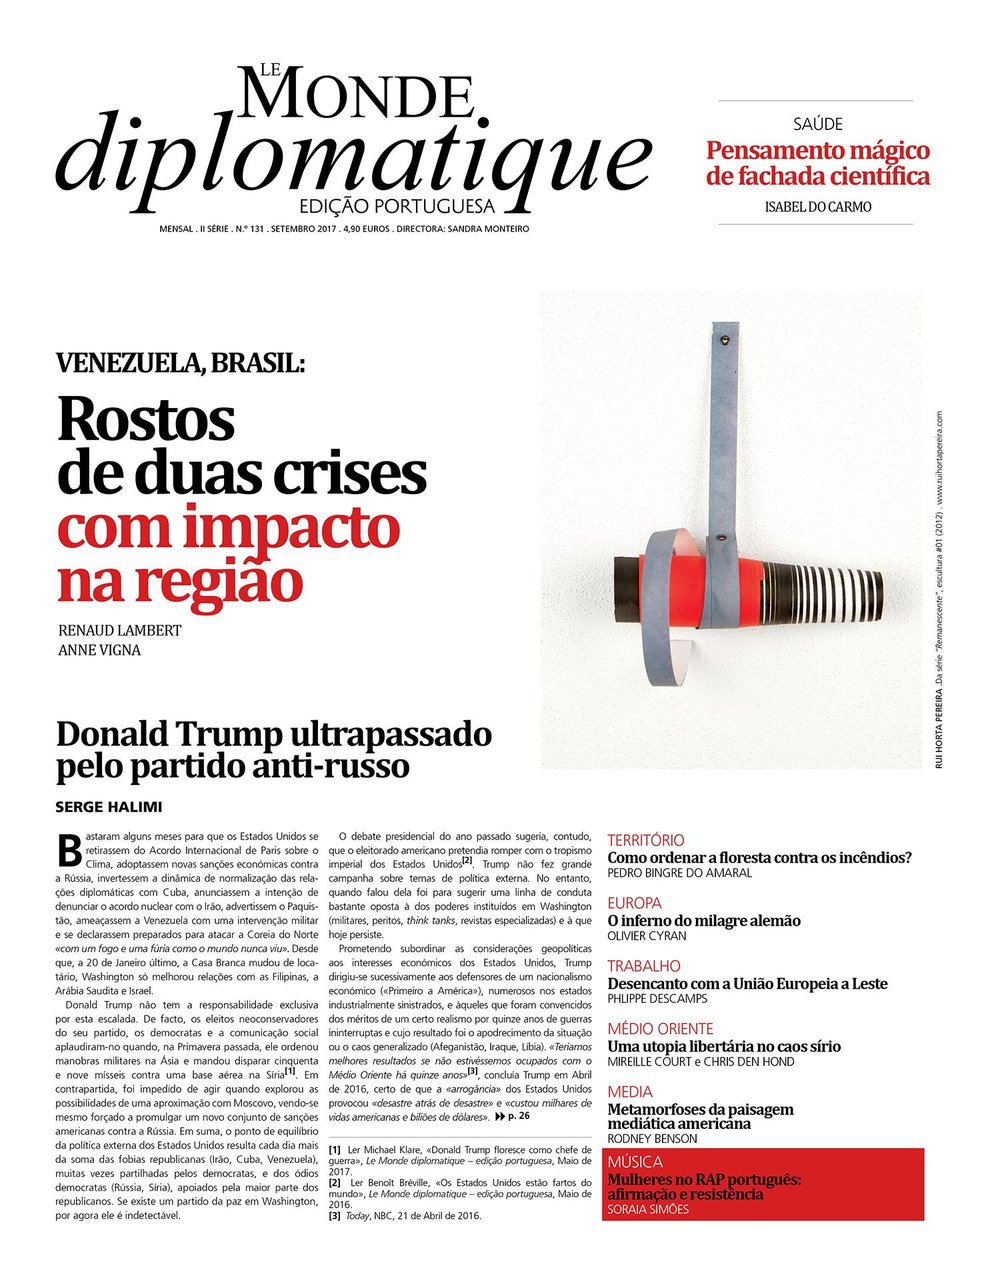 Le Monde Diplomatique, Edição portuguesa